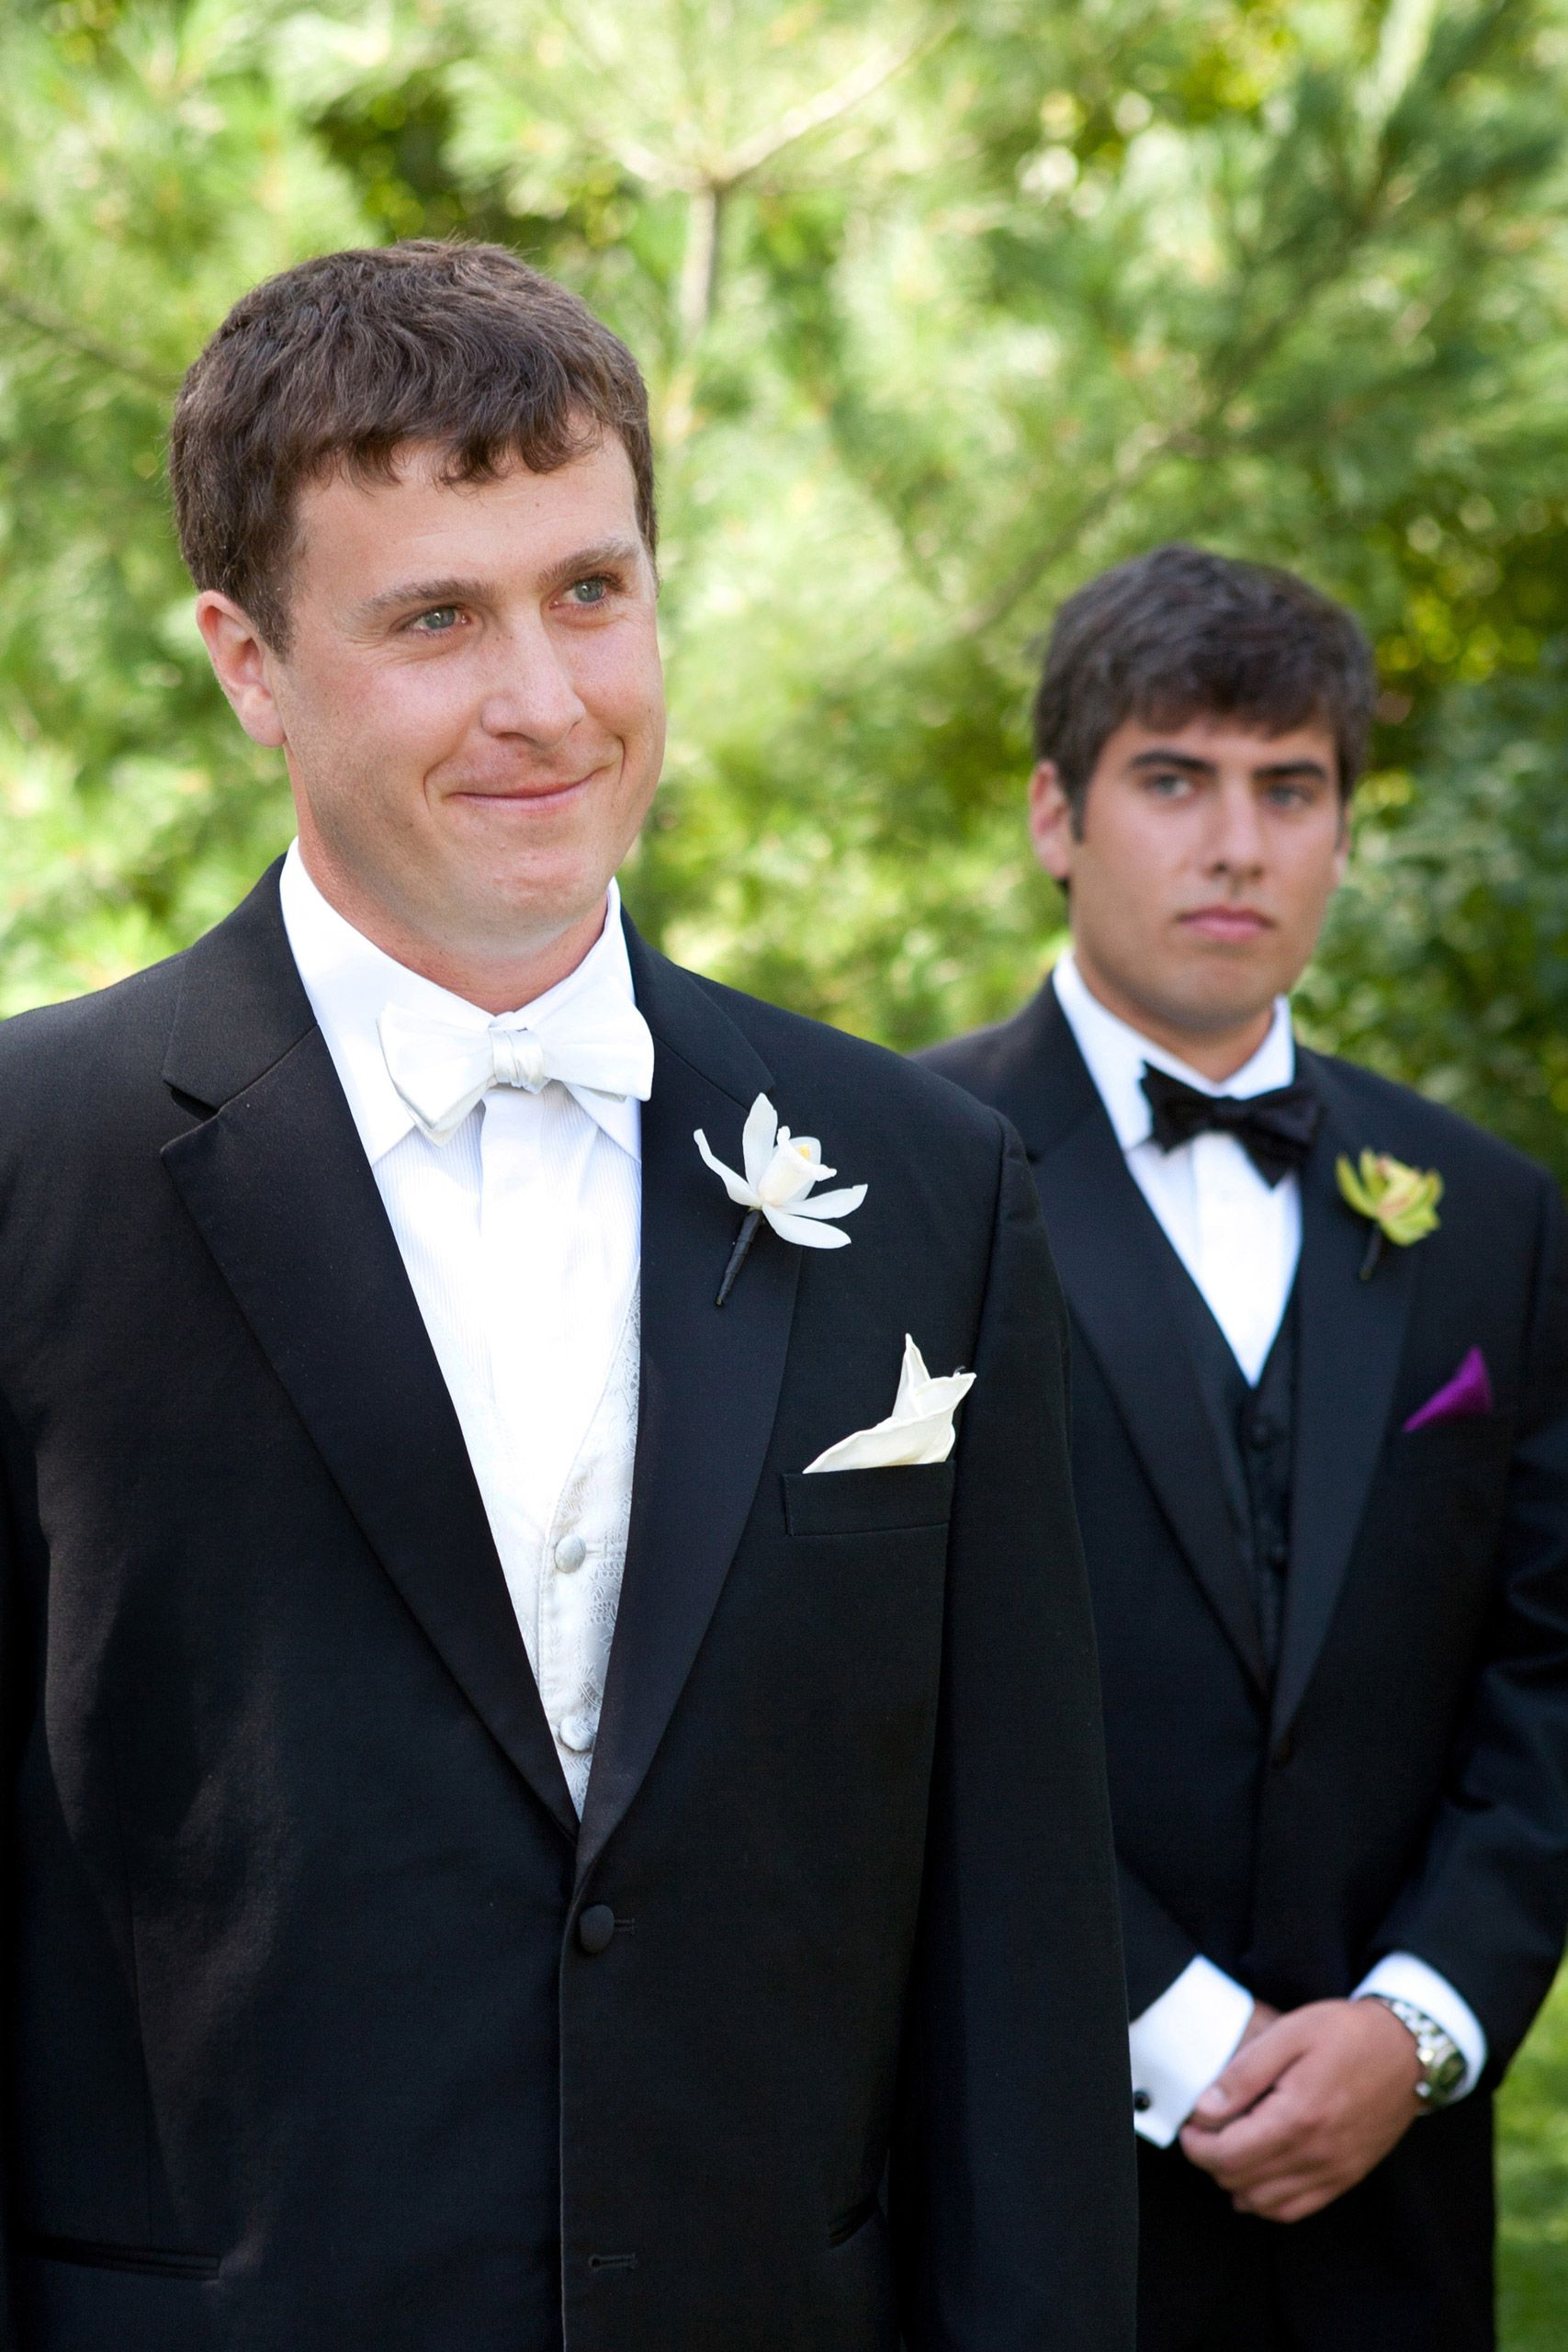 002_Boulder_creek_wedding.jpg